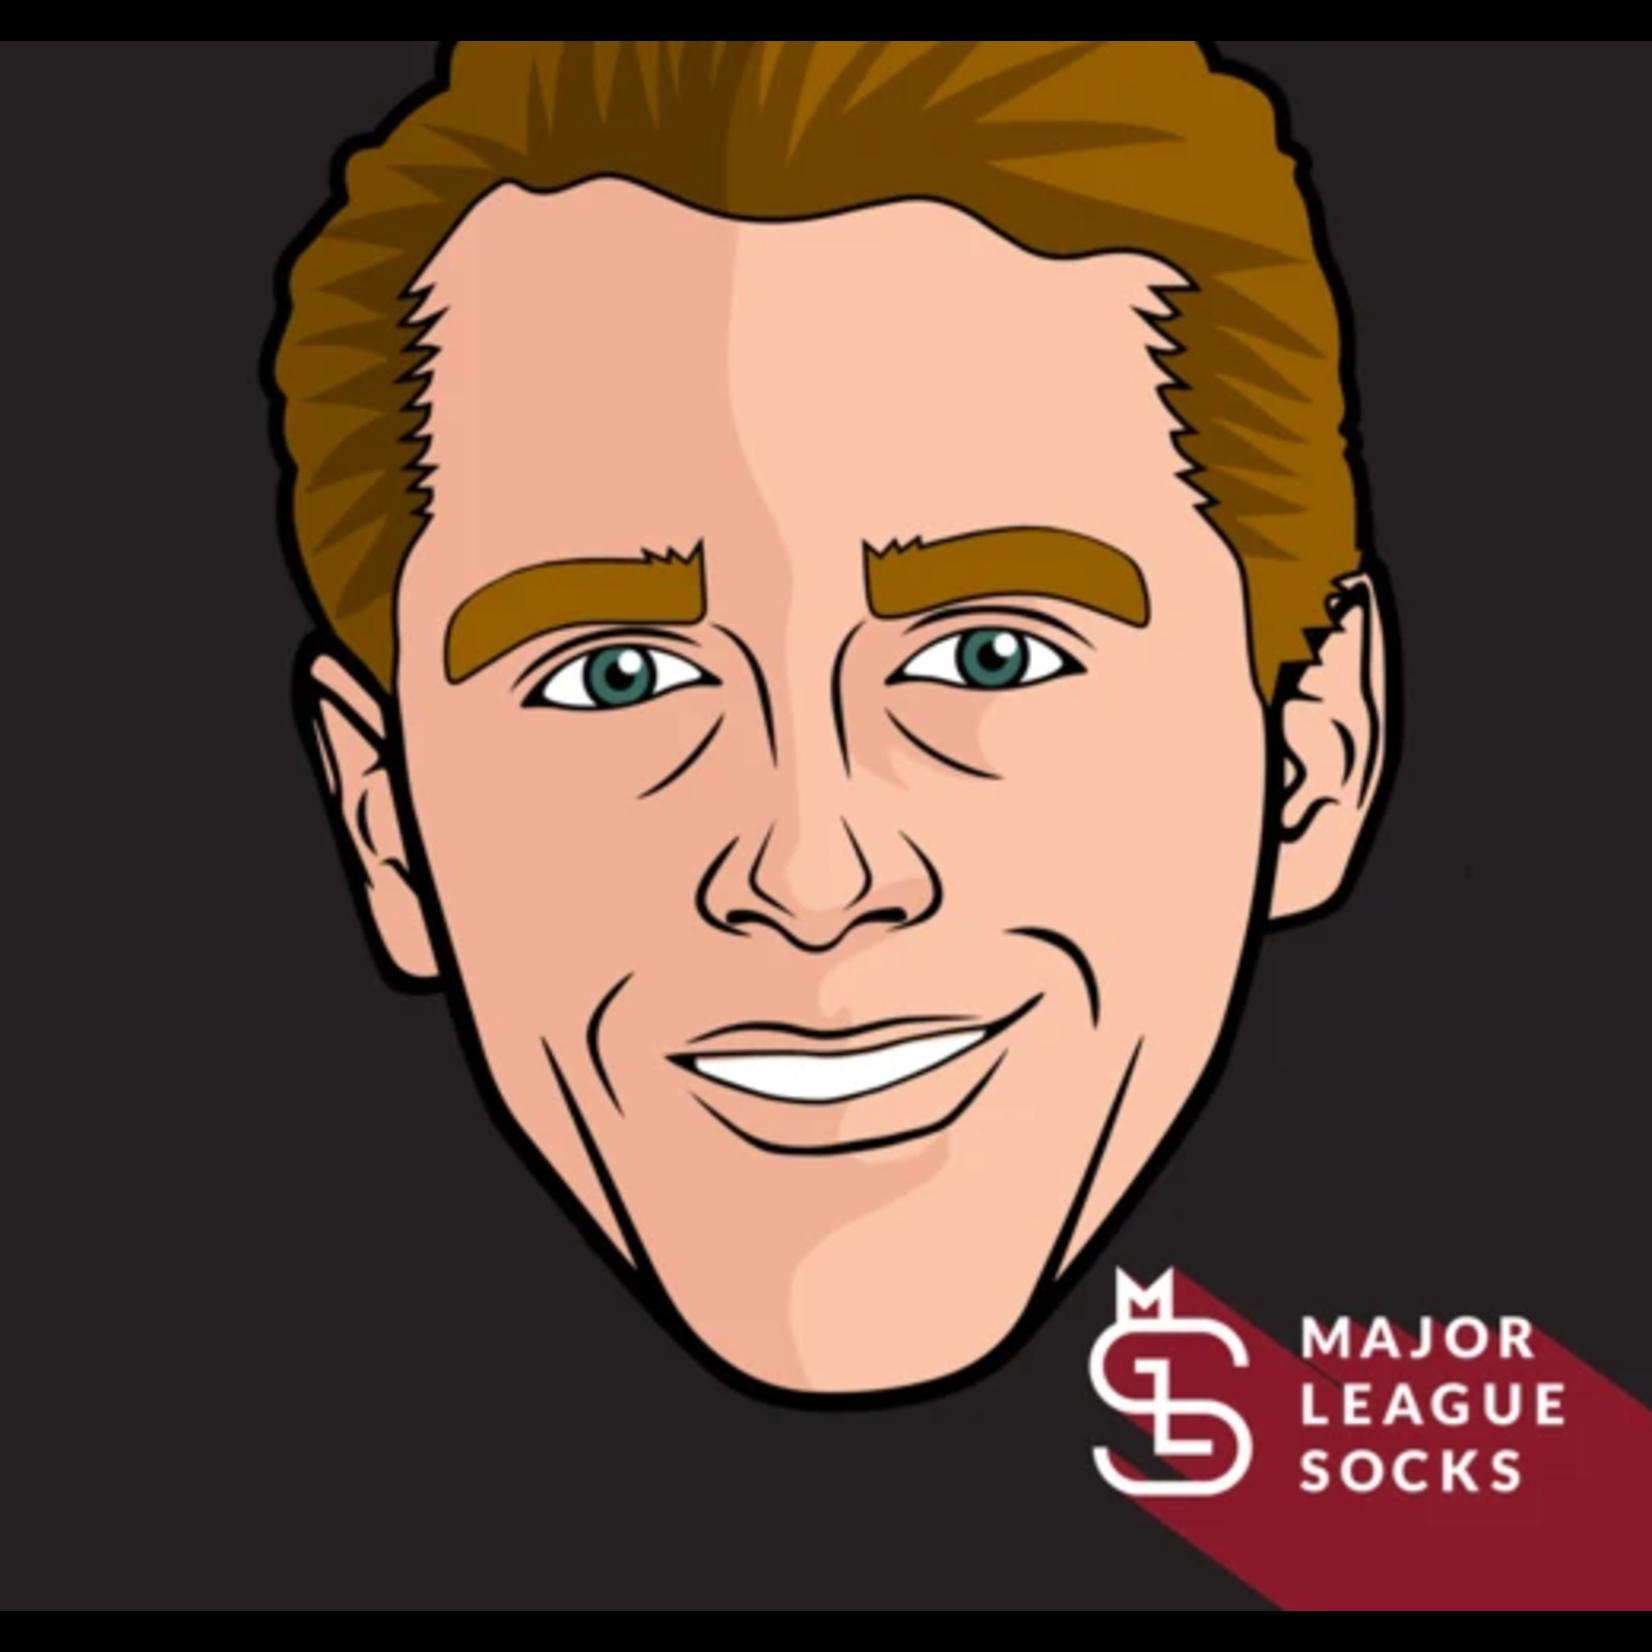 Major League Socks - Patrick Kane